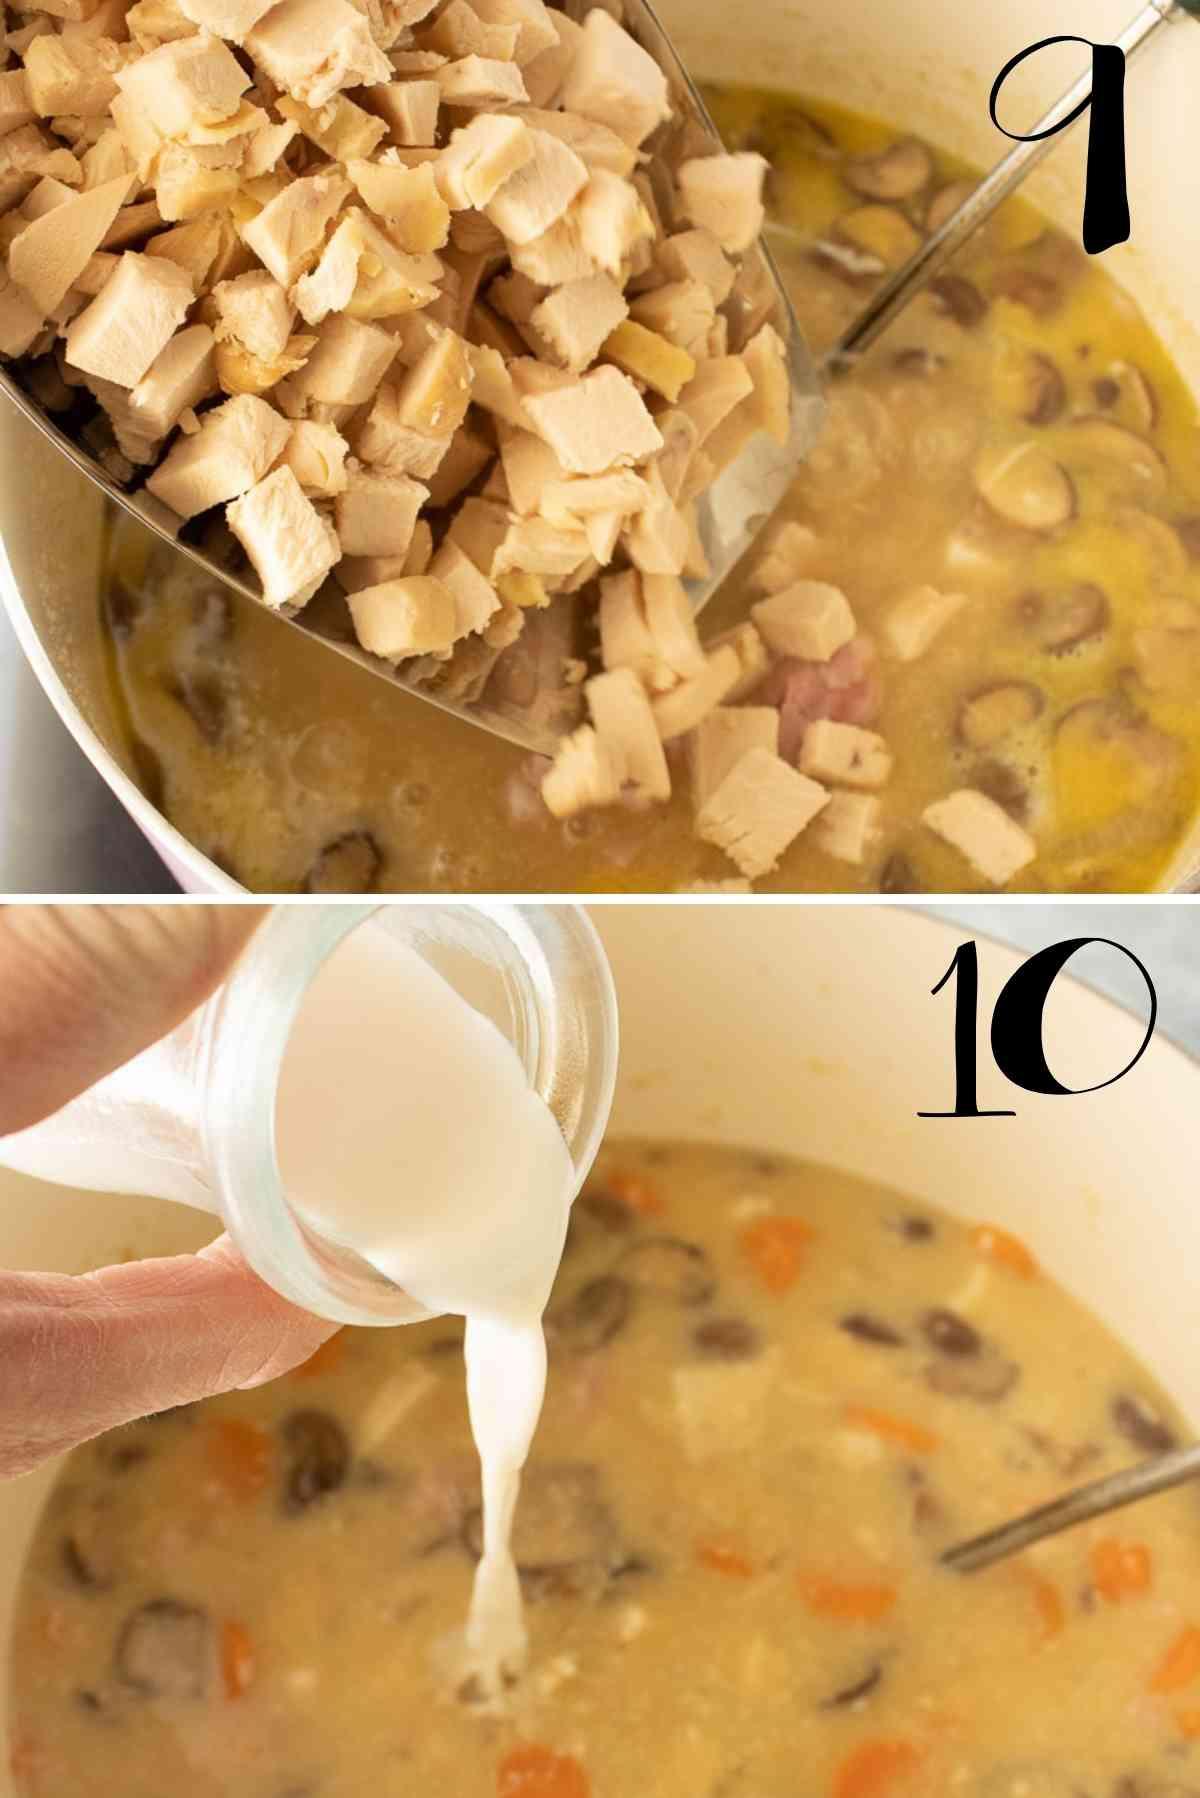 Adding of chicken and milk.